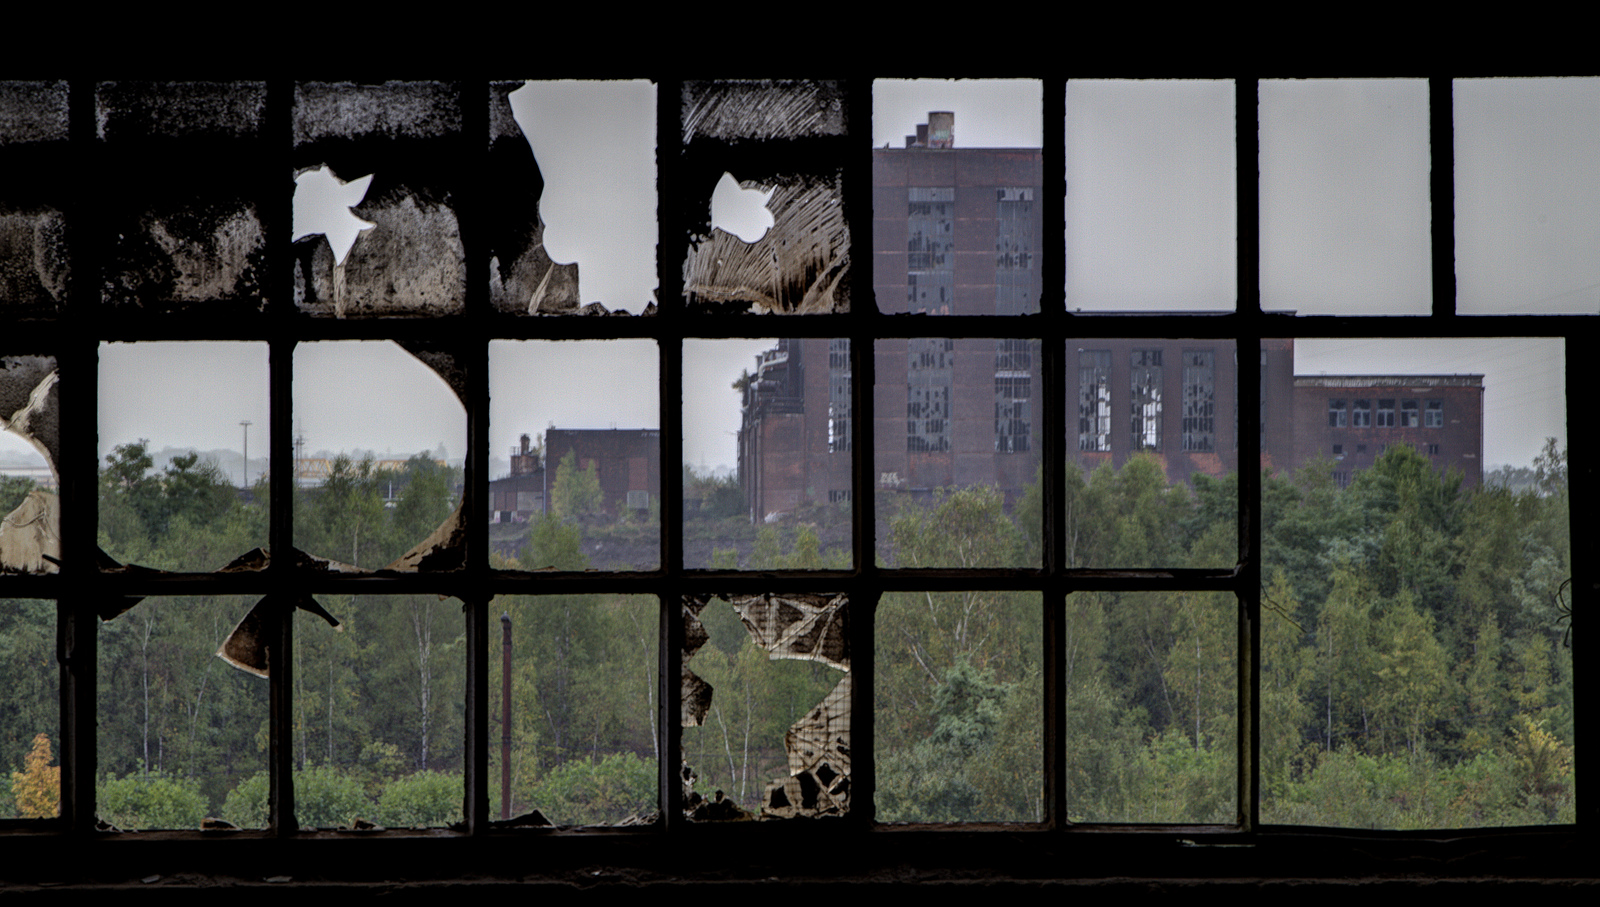 Capturing Transience: Urban Exploration Photography